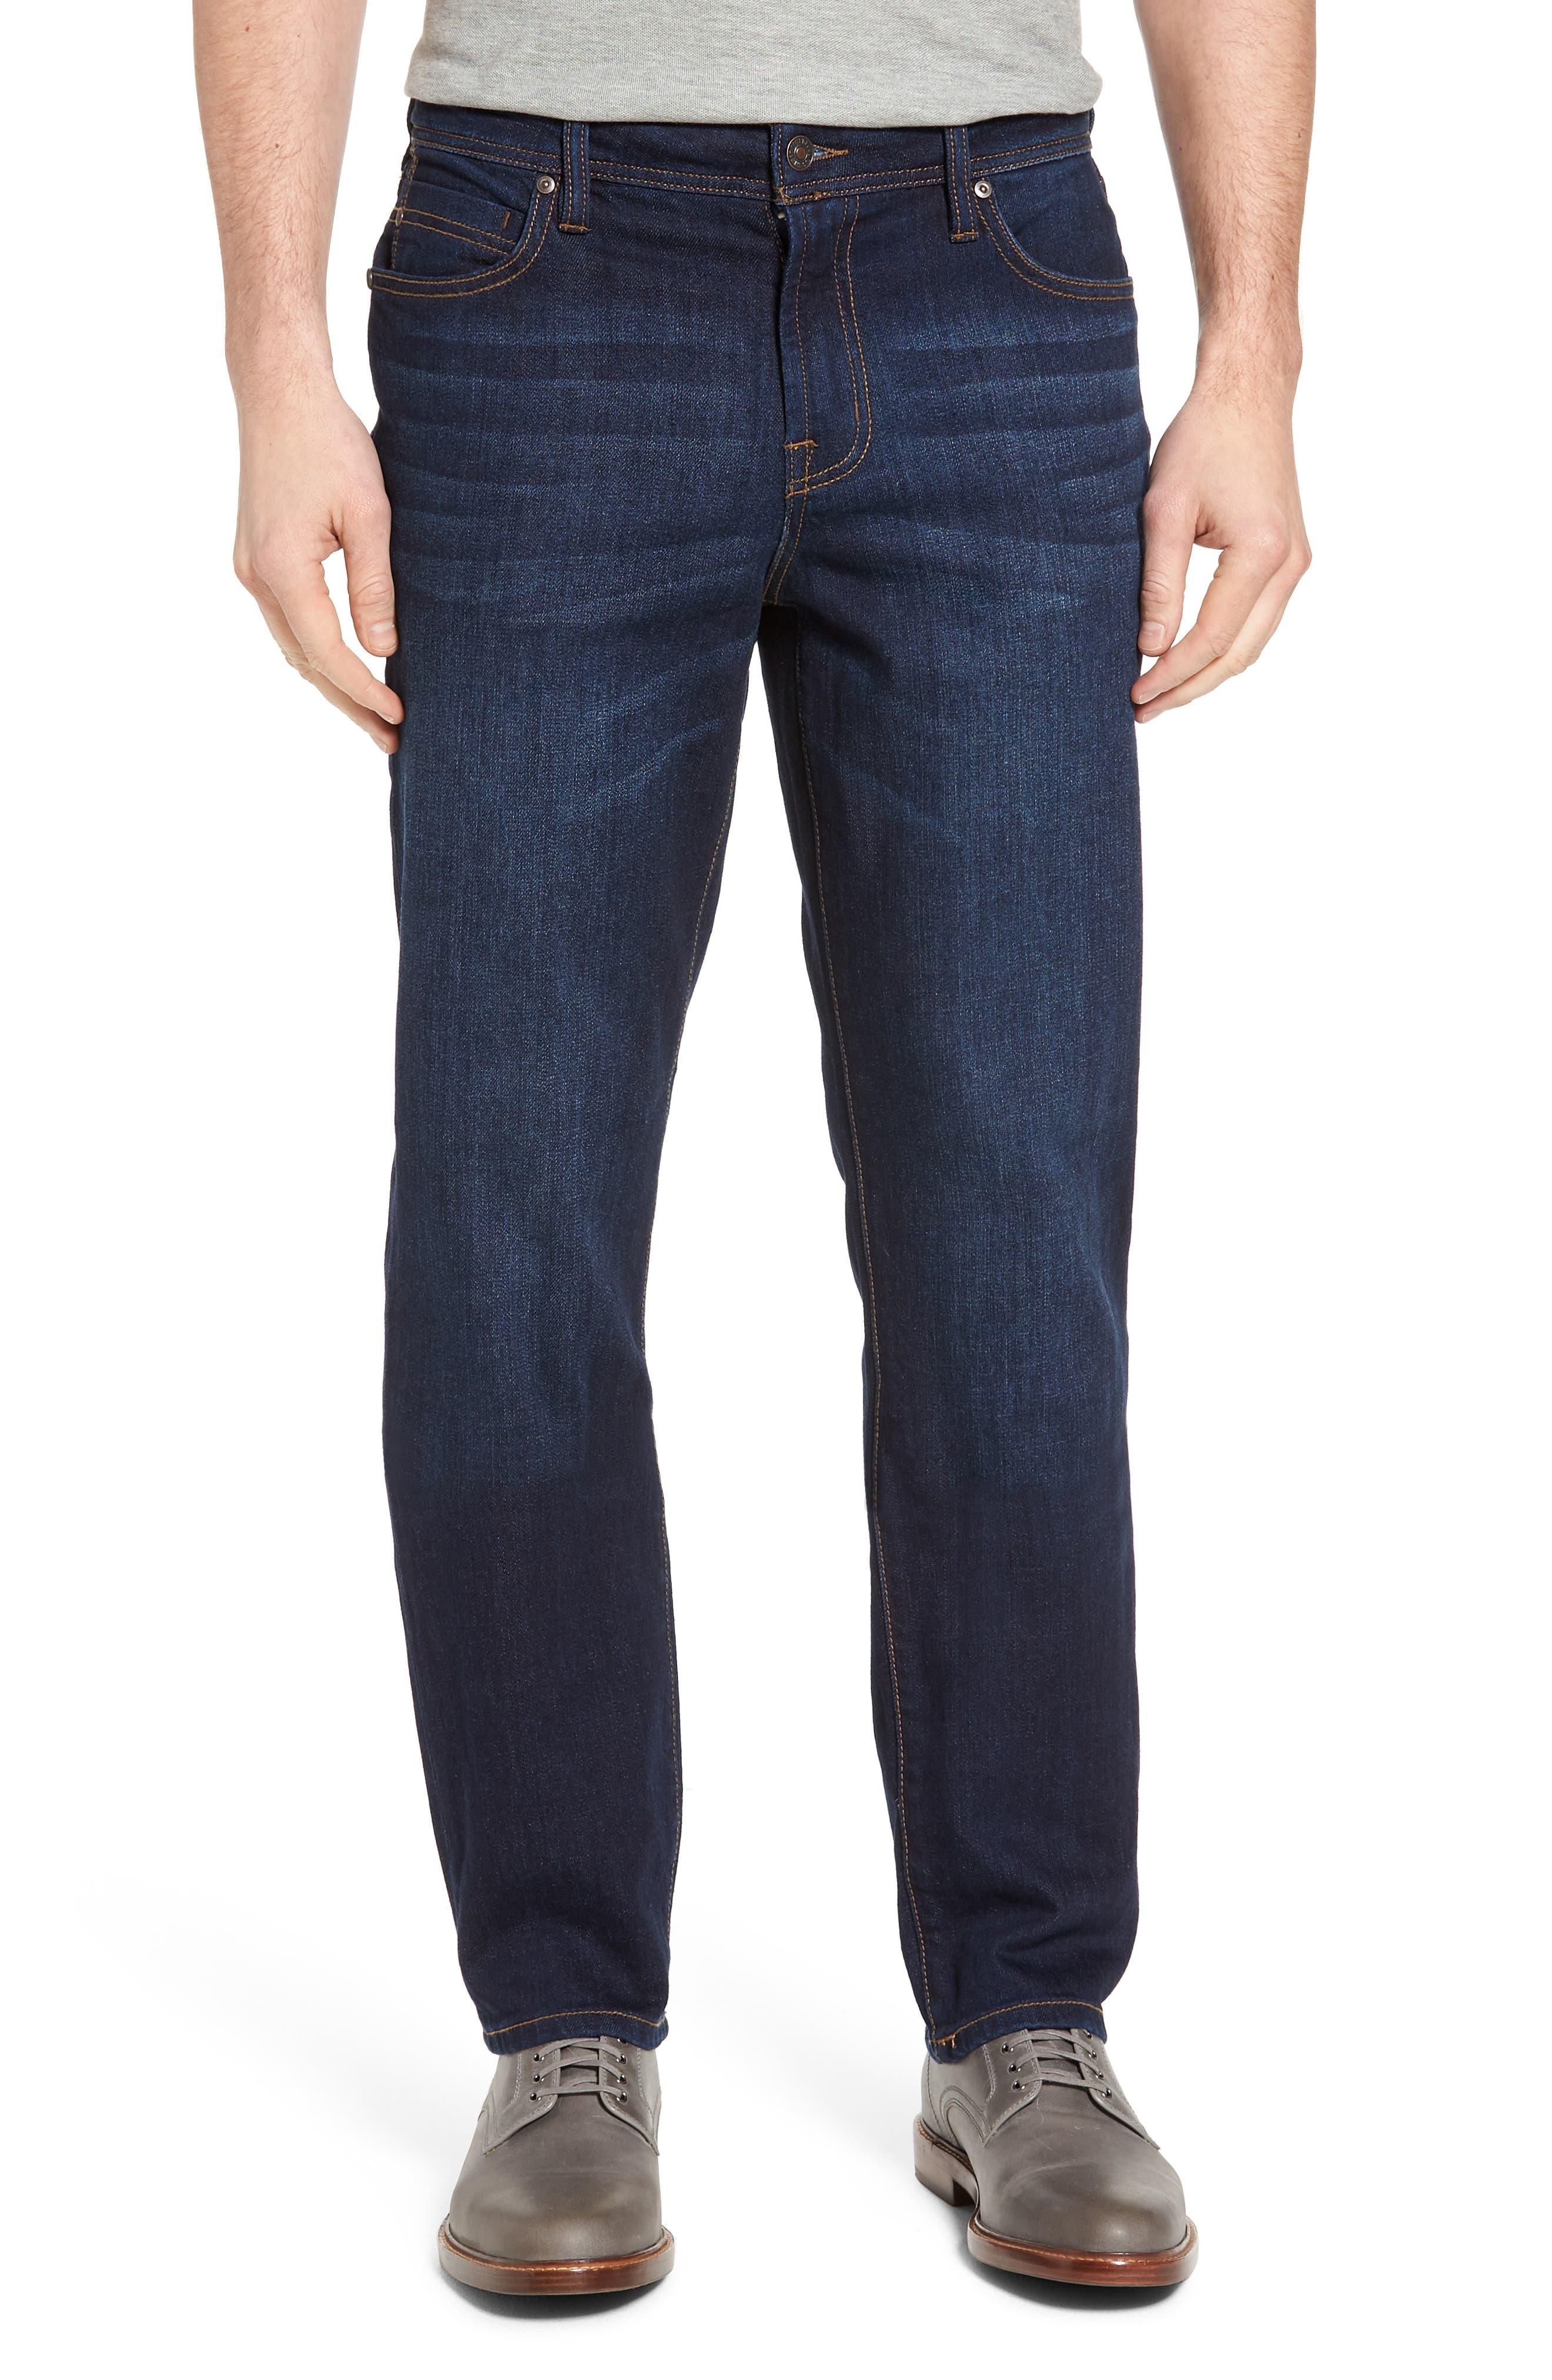 Jeans Co. Regent Relaxed Fit Jeans,                             Main thumbnail 1, color,                             SAN ARDO VINTAGE DARK